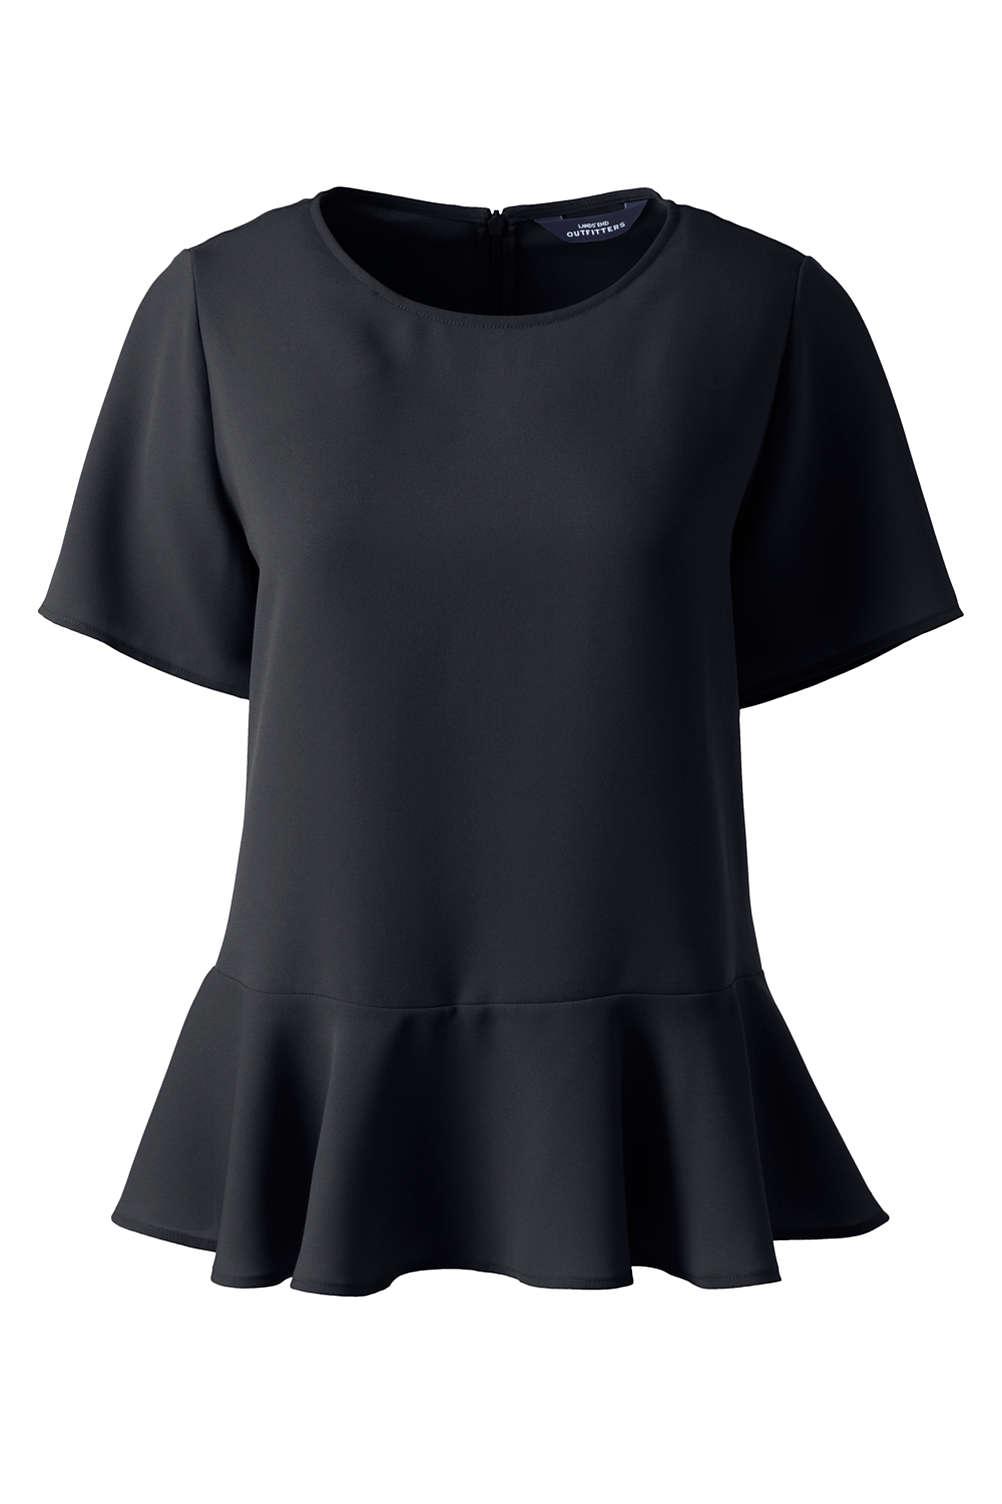 b3d6241379a78 Women s Plus Size Short Sleeve Ruffle Hem Crepe Blouse from Lands  End